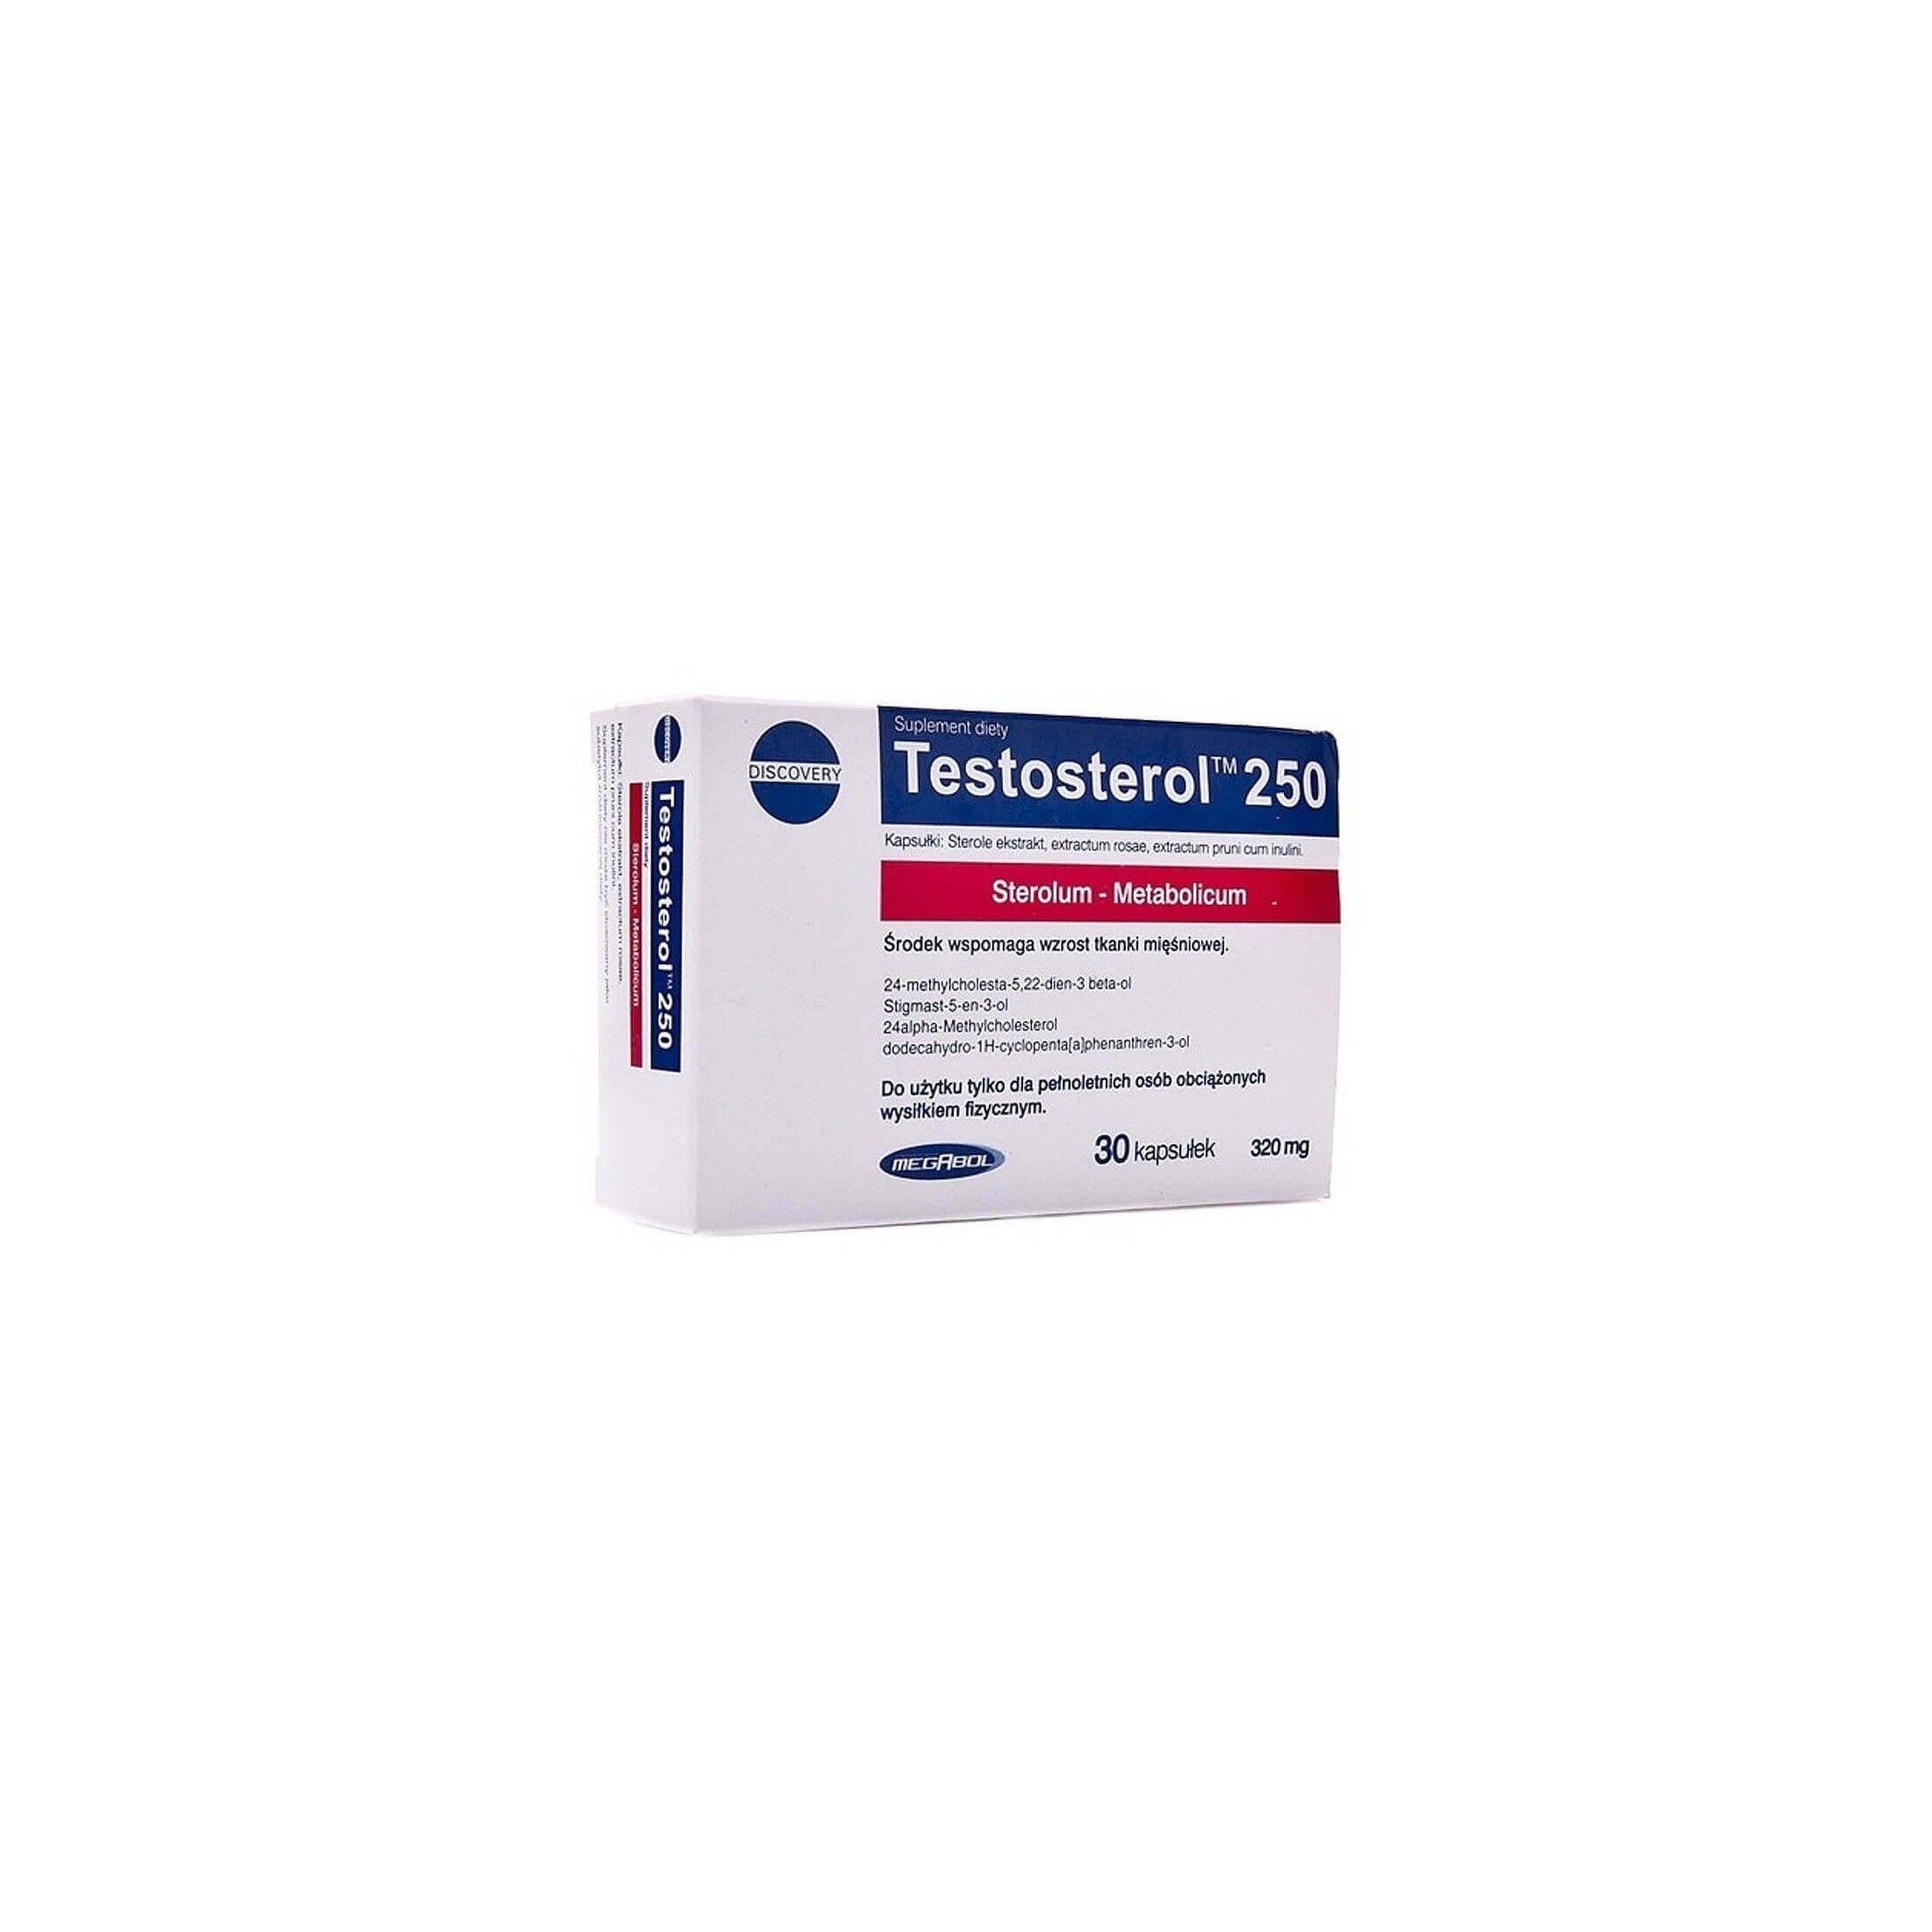 Trec L-Arginine Xtreme 90 kaps.